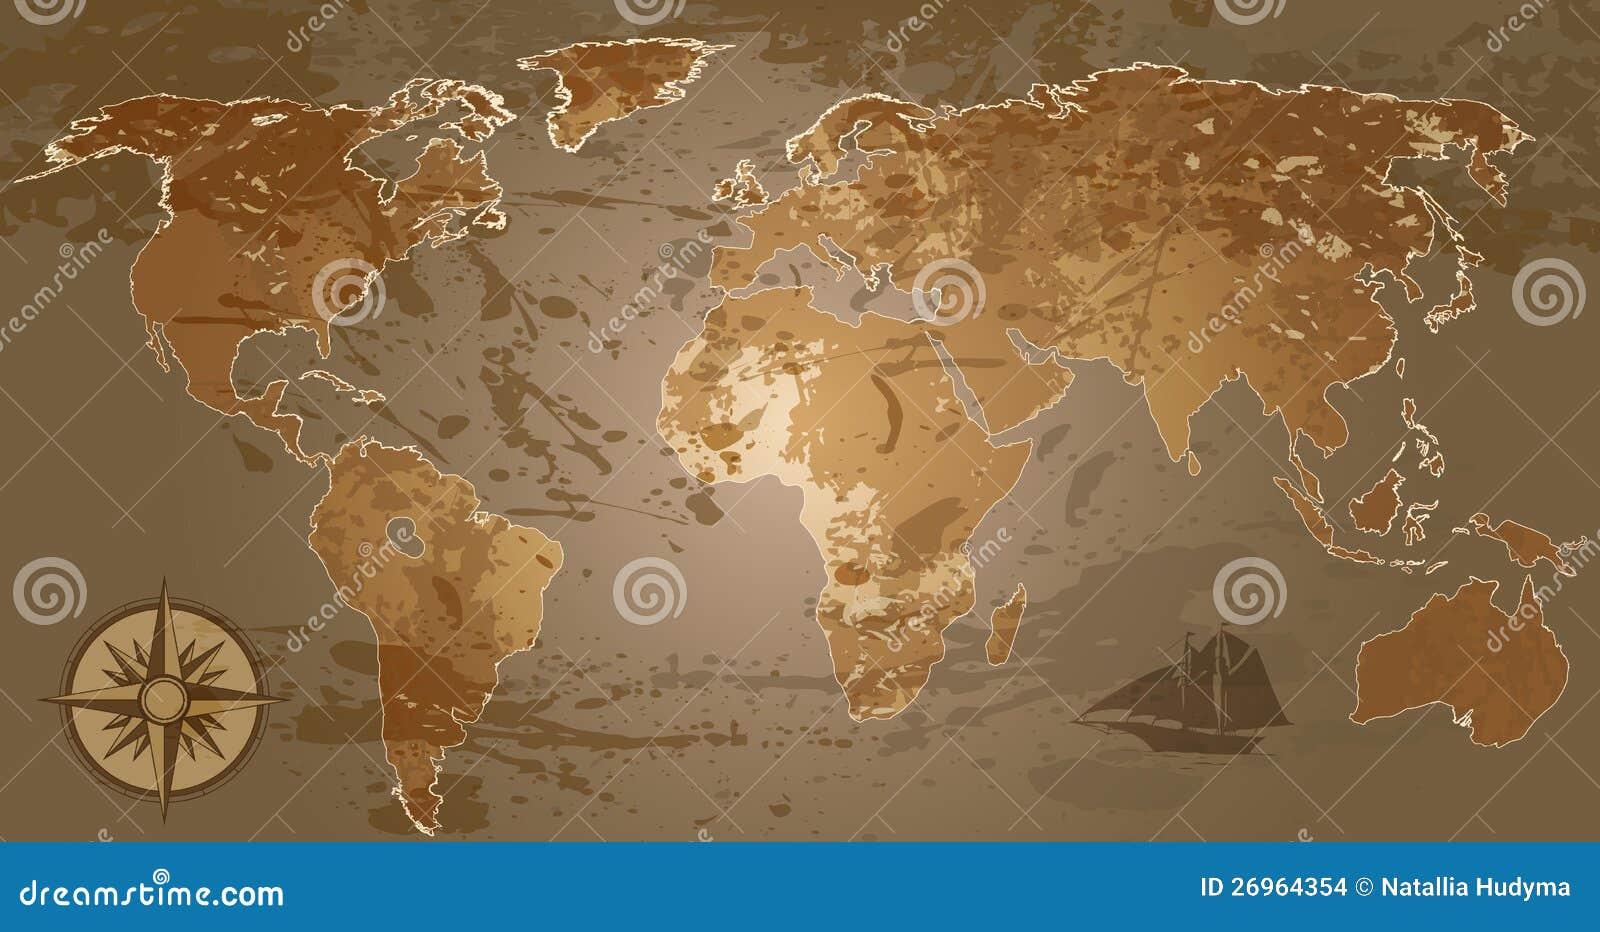 Grunge World Map Stock Vector Illustration Of Journey 26964354